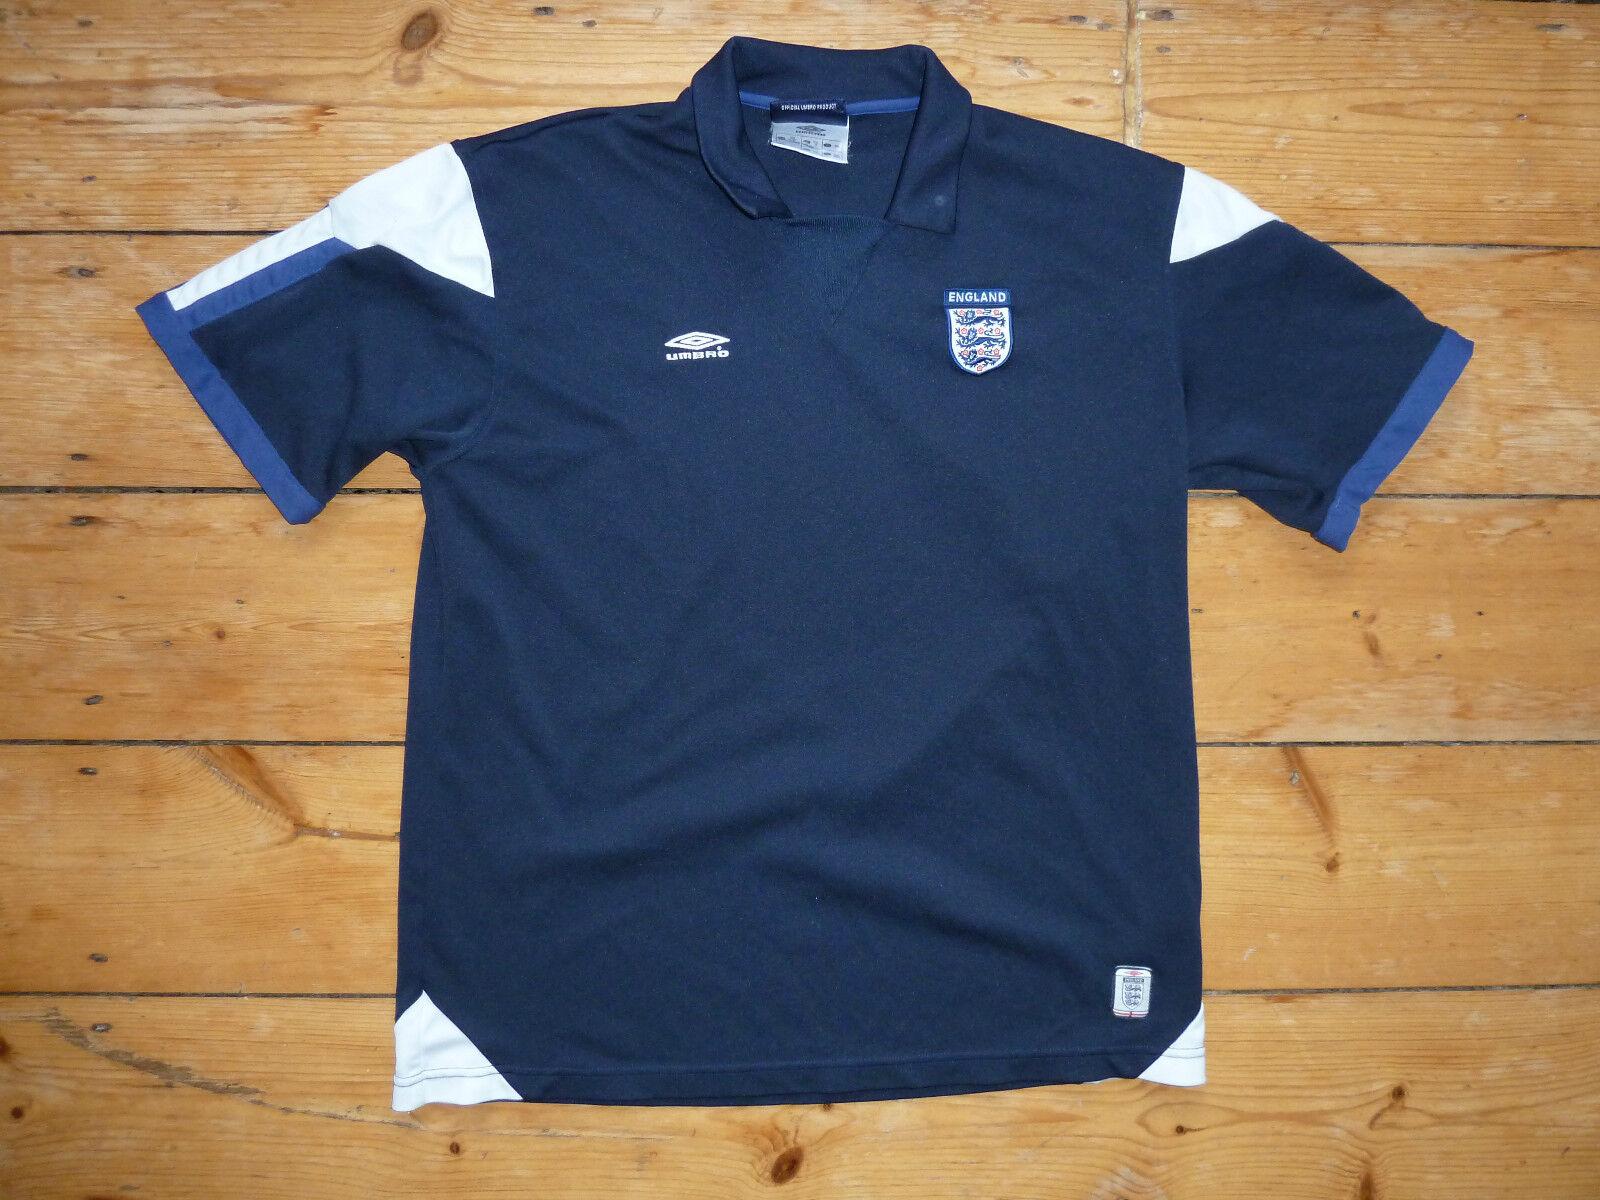 England Fußball Shirt XL 1998 England Fußball Trikot Maglia Camiseta Euro 16